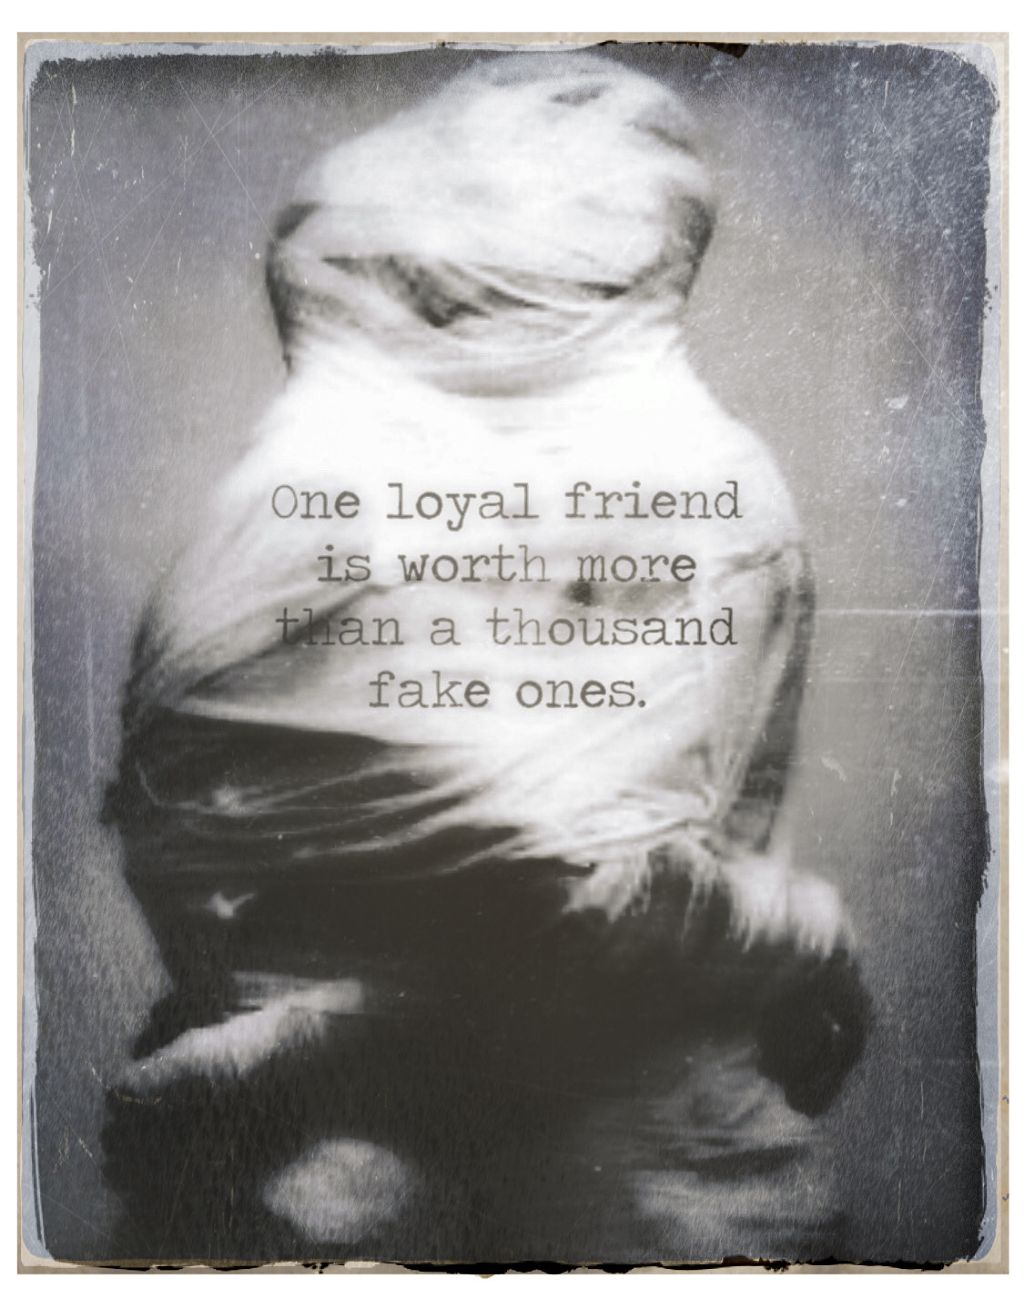 TRUTH  #loyalty #friend #emotions #babelart #madewithpicsart #bound #trust #myedit    #freetoedit